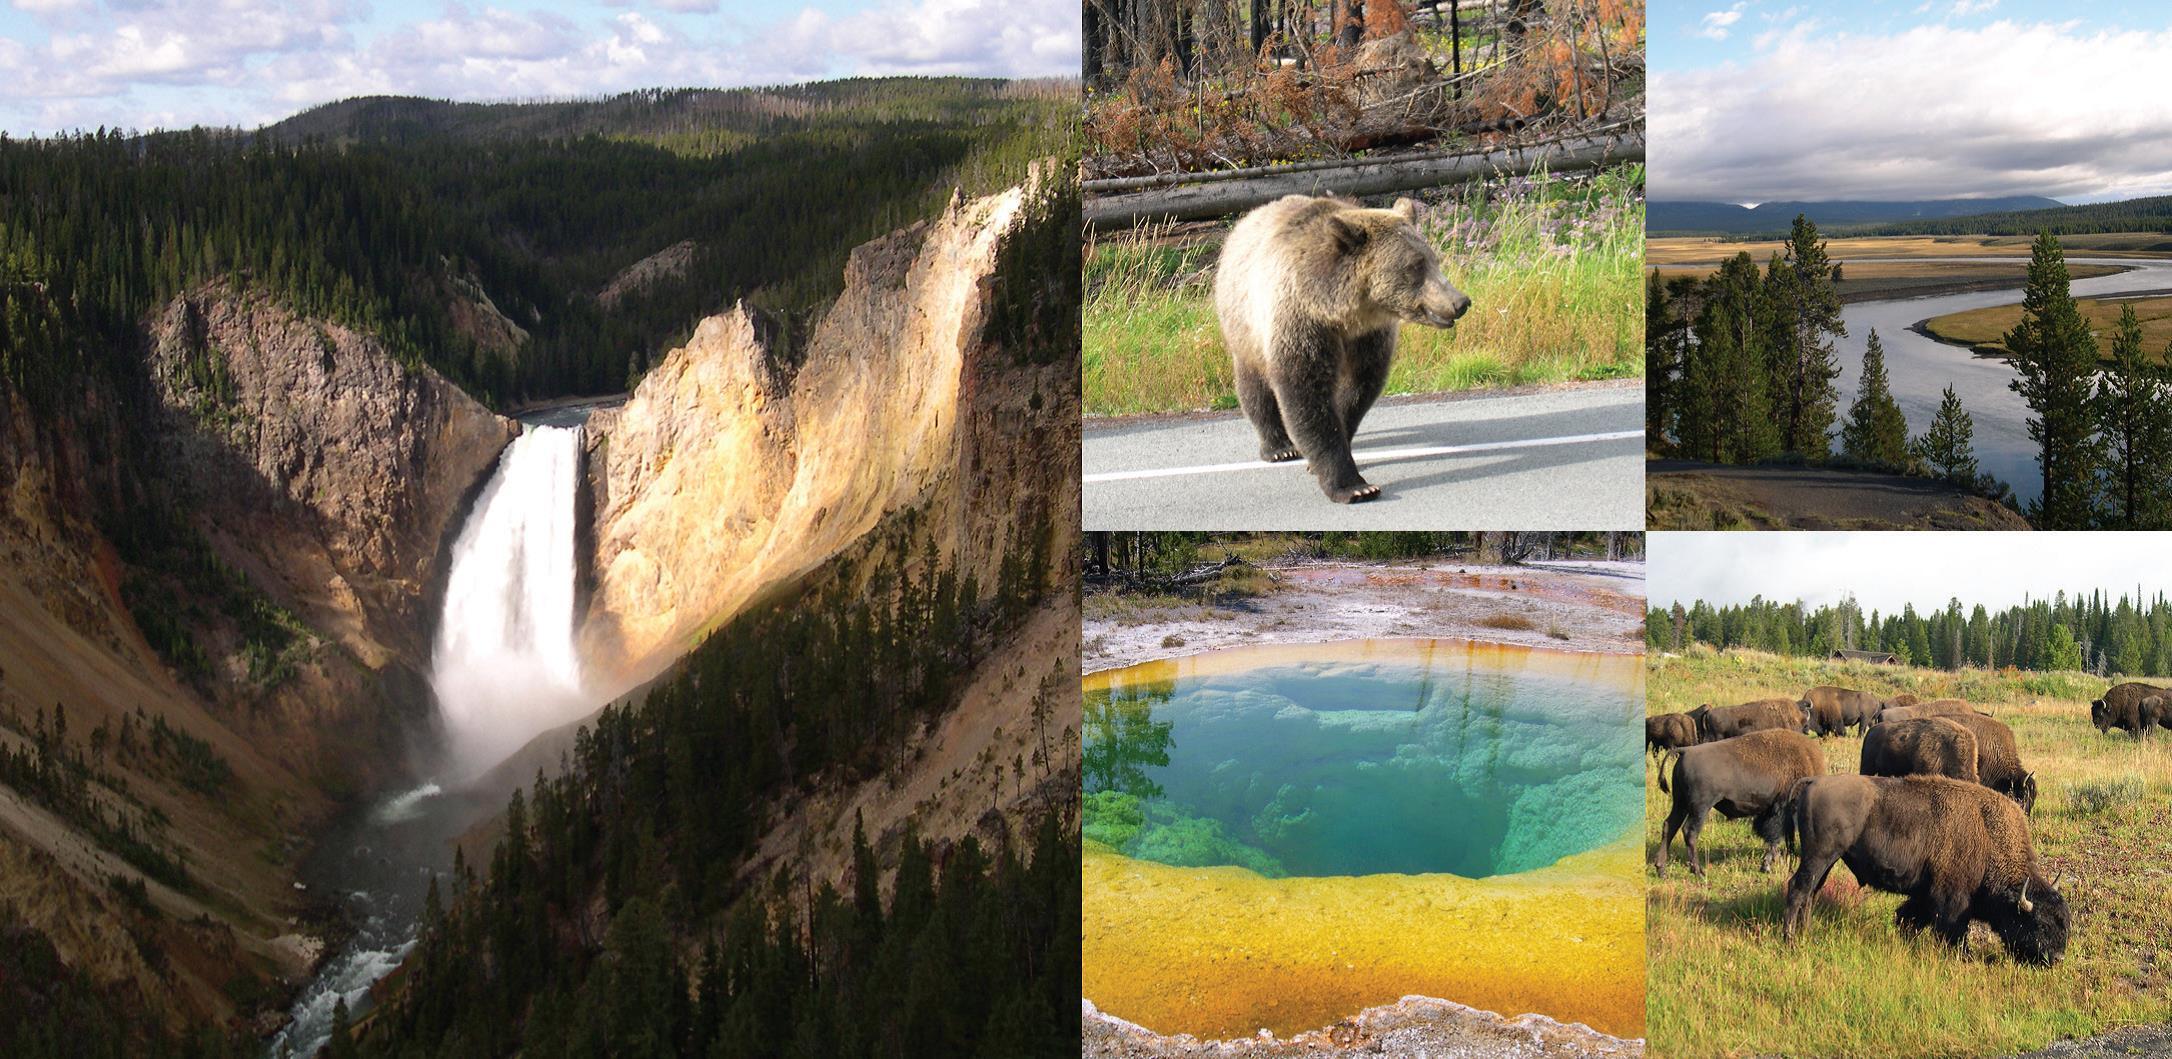 Seminar in Yellowstone National Park